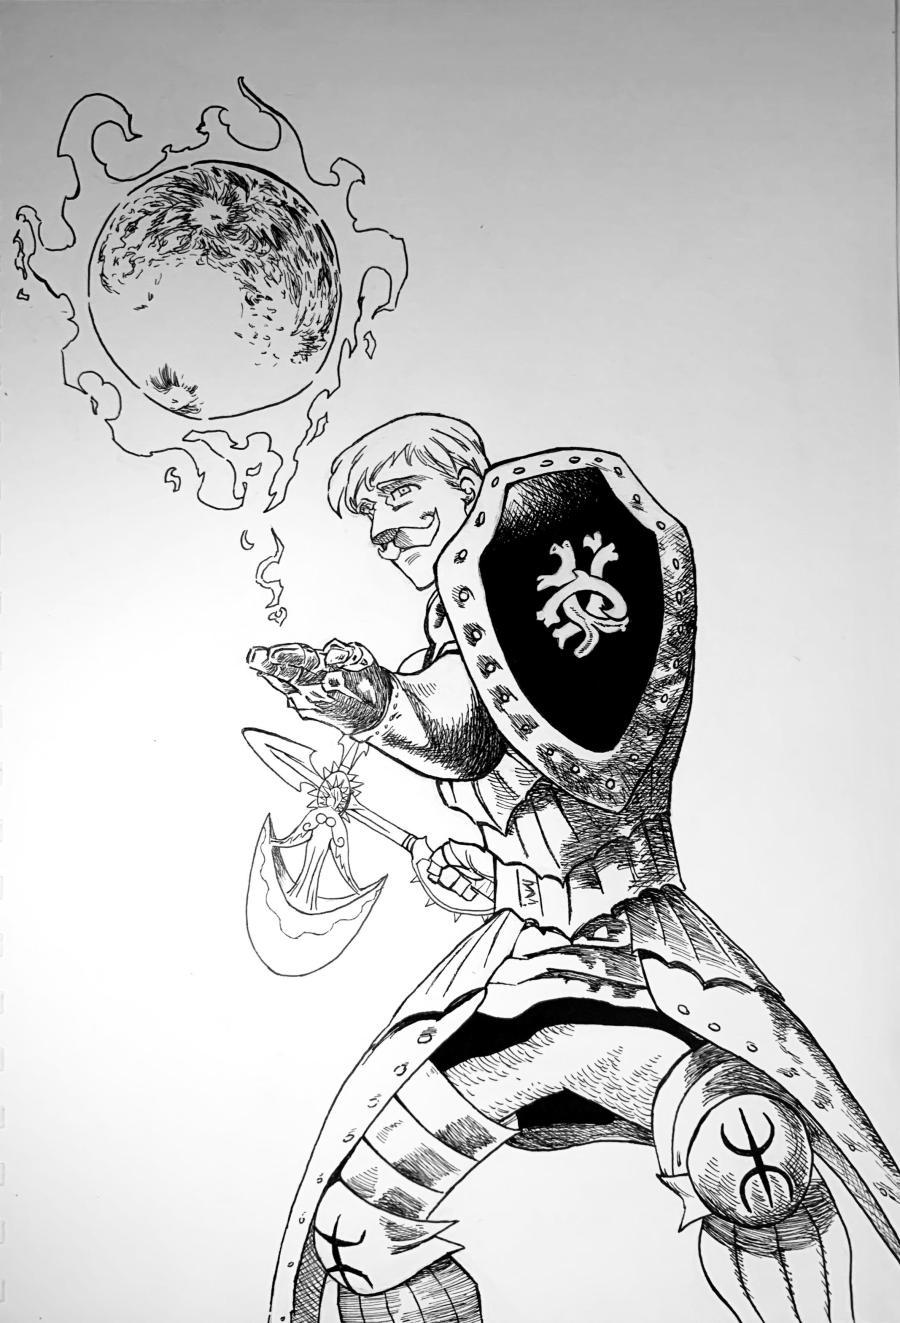 Nanatsu no taizai Escanor drawing, his Sunshine is stronger than ever!